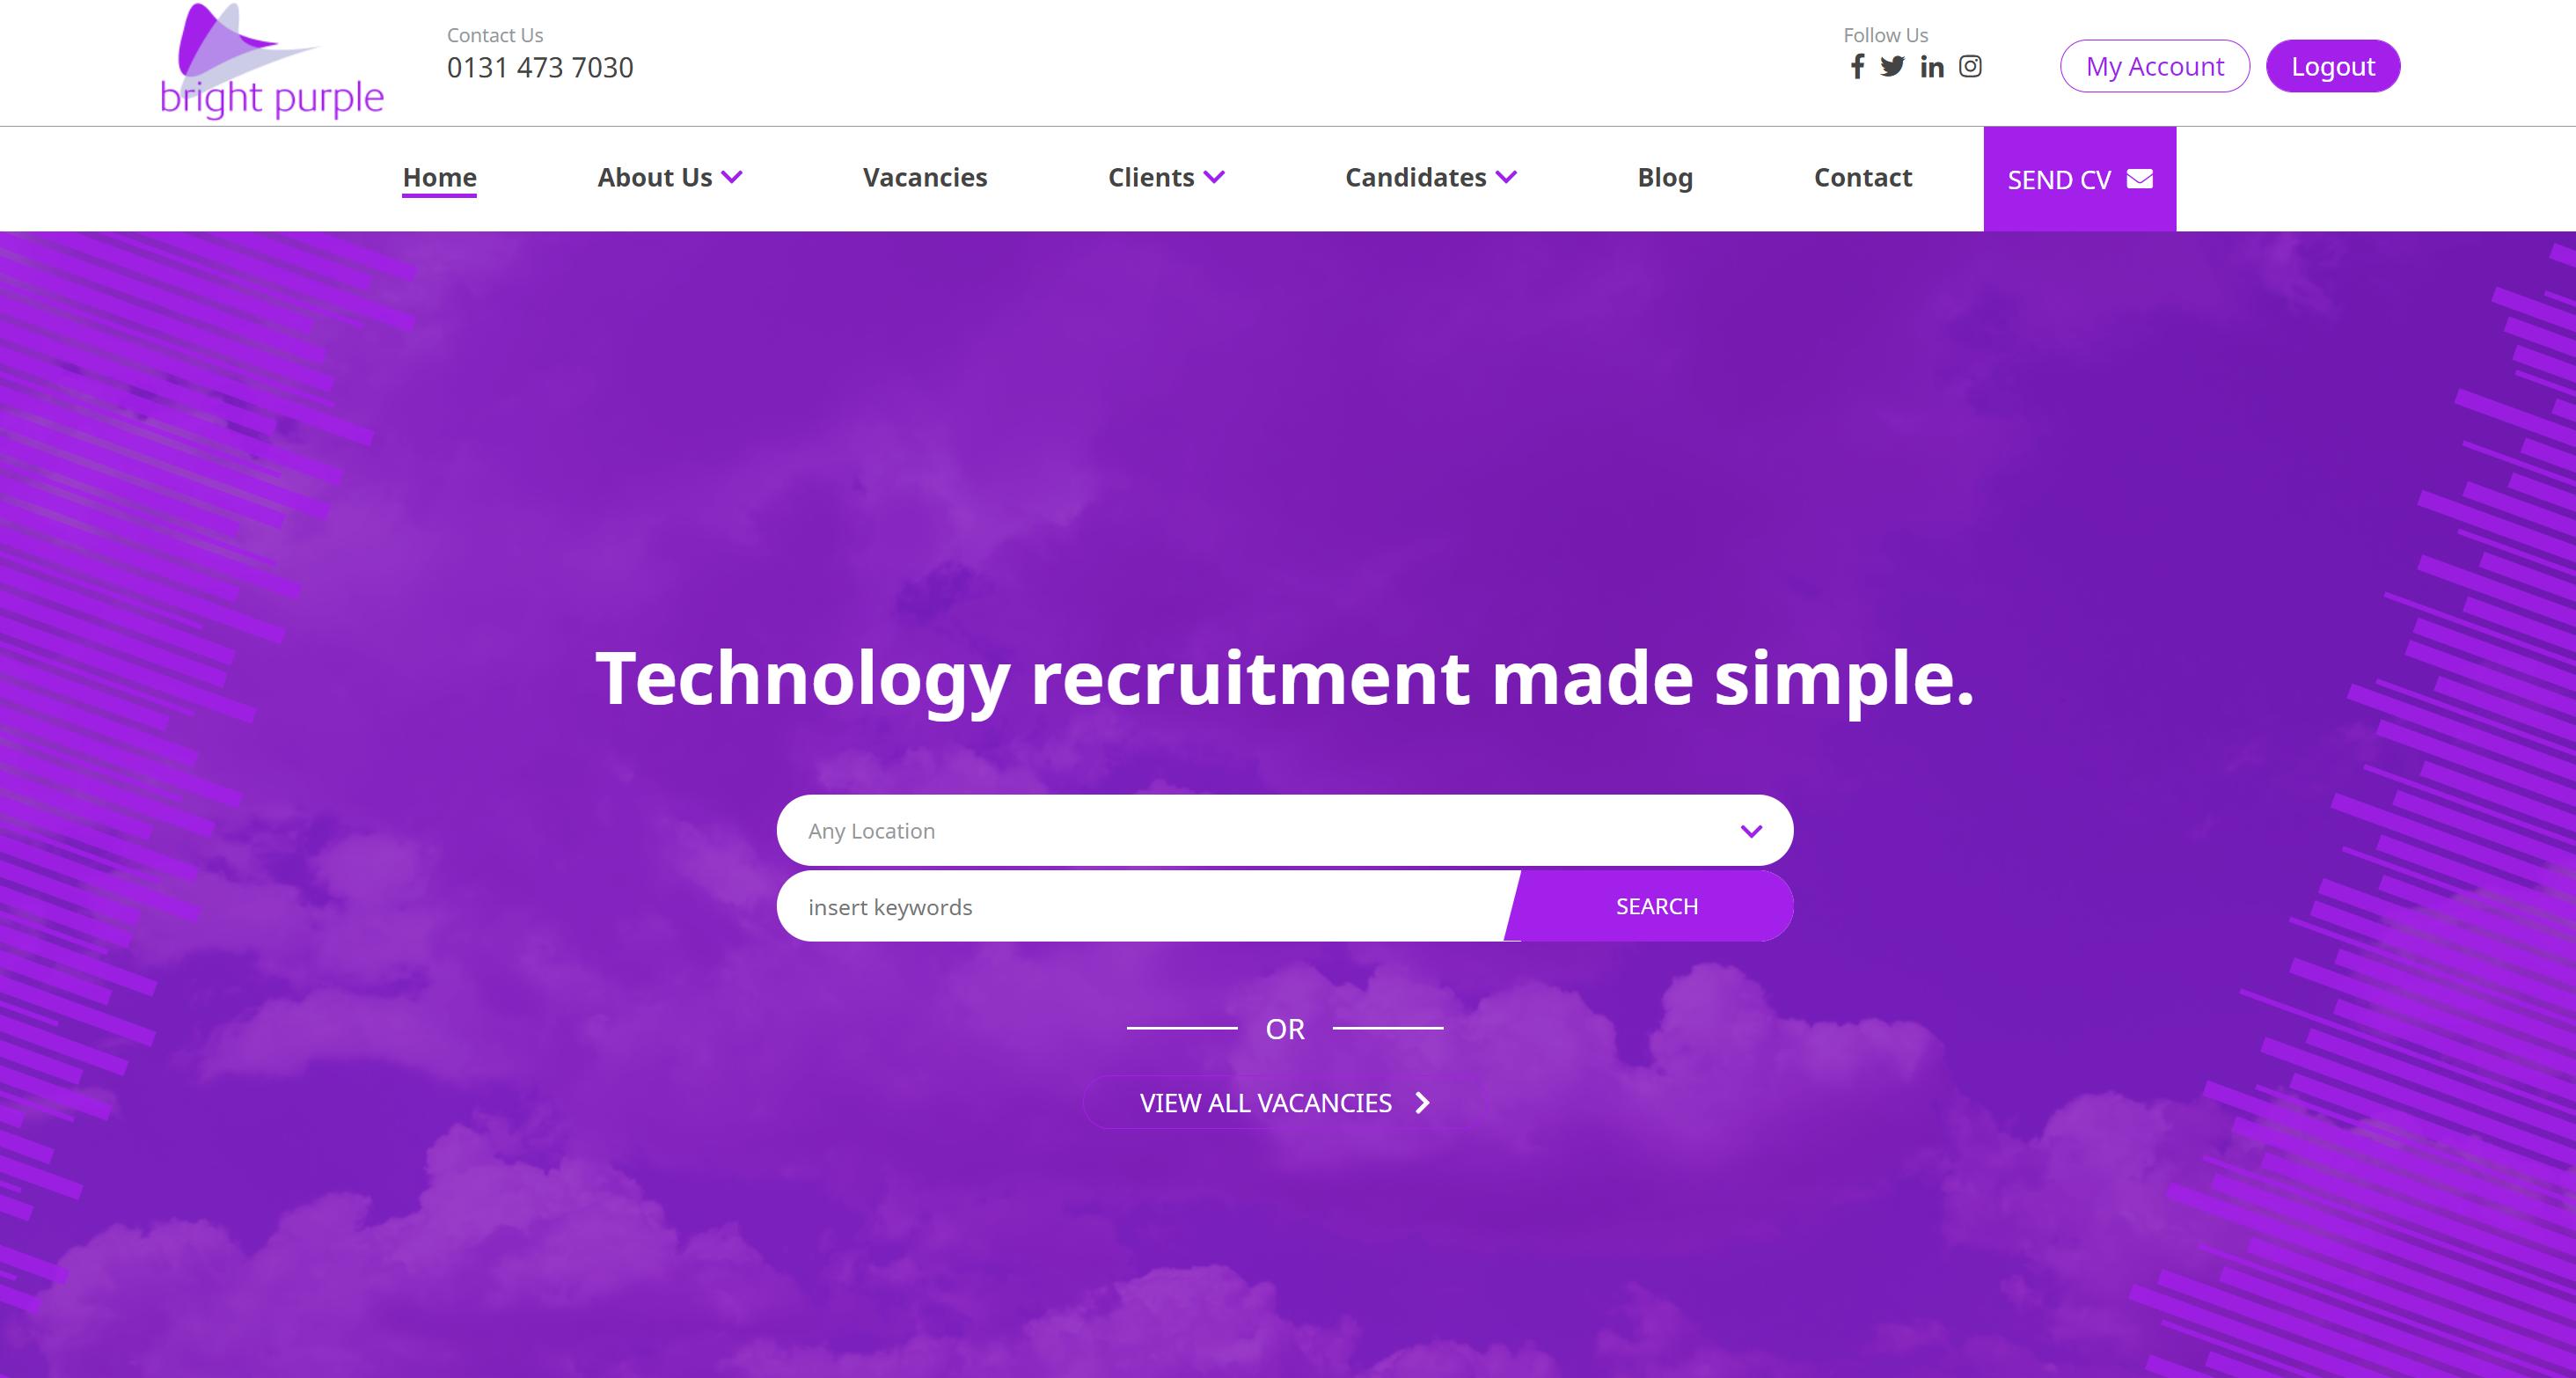 The Bright Purple website homepage